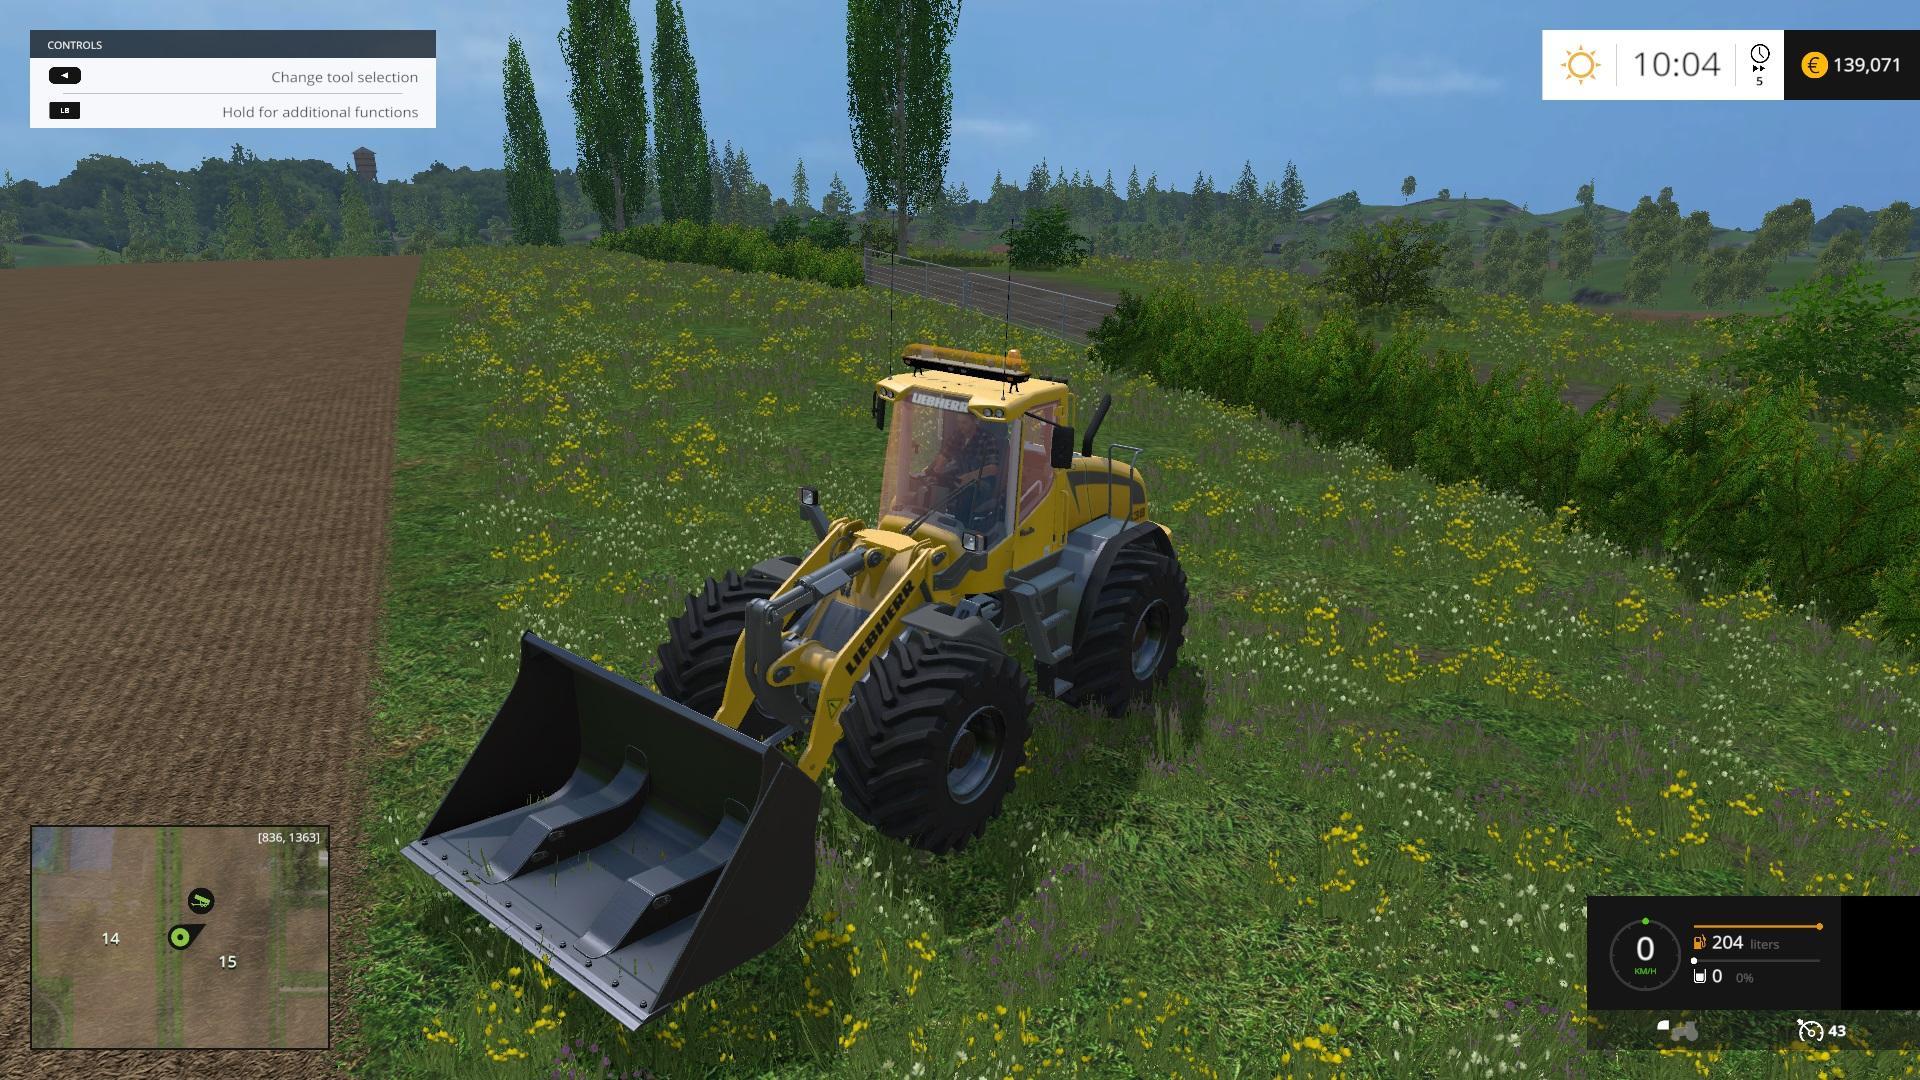 LIEBHERR538 PACK V1 0 • Farming simulator 19, 17, 15 mods | FS19, 17